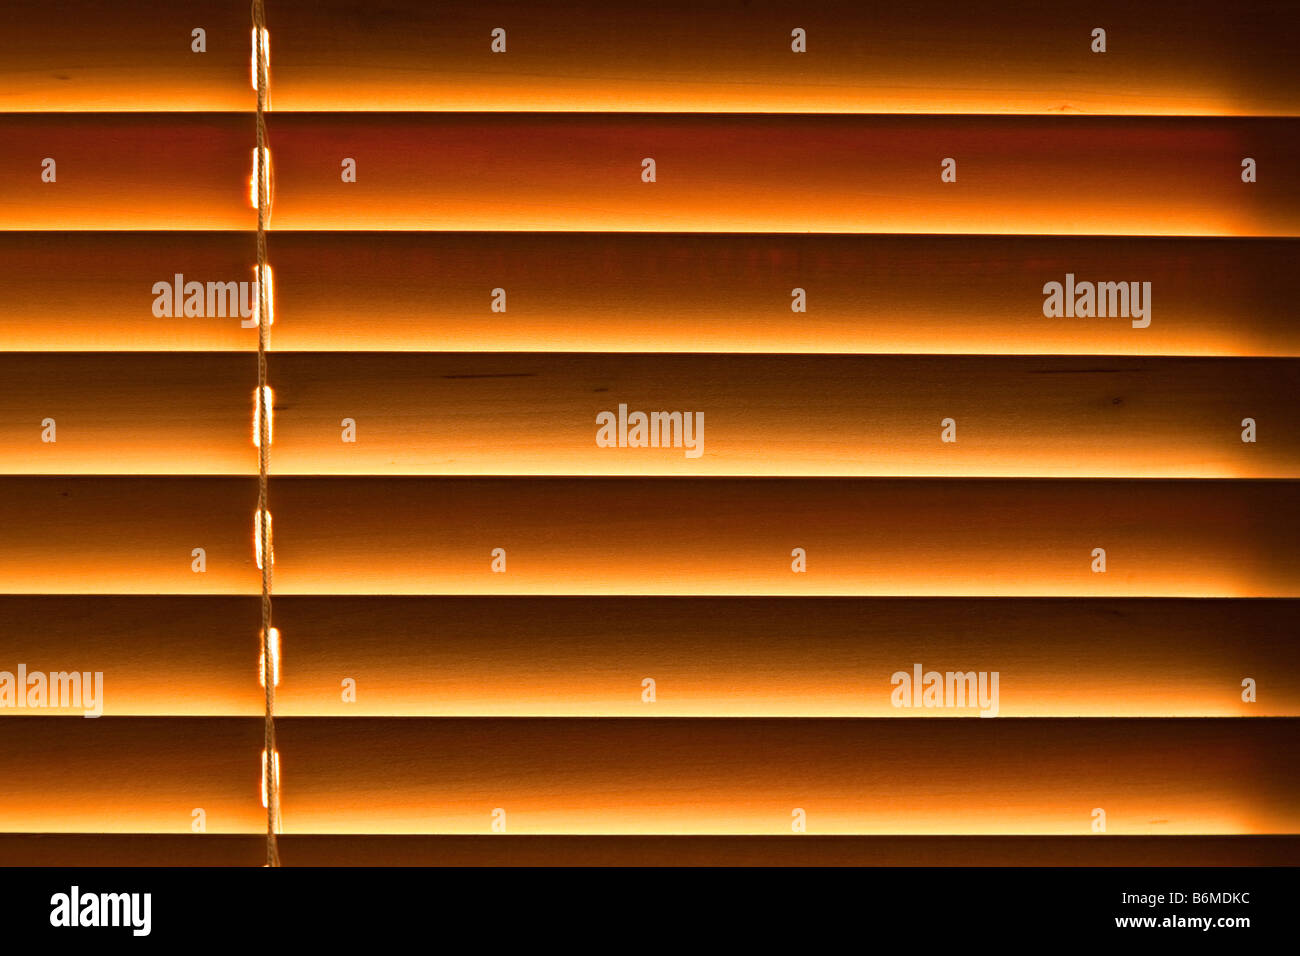 Wooden venetian blinds - Stock Image